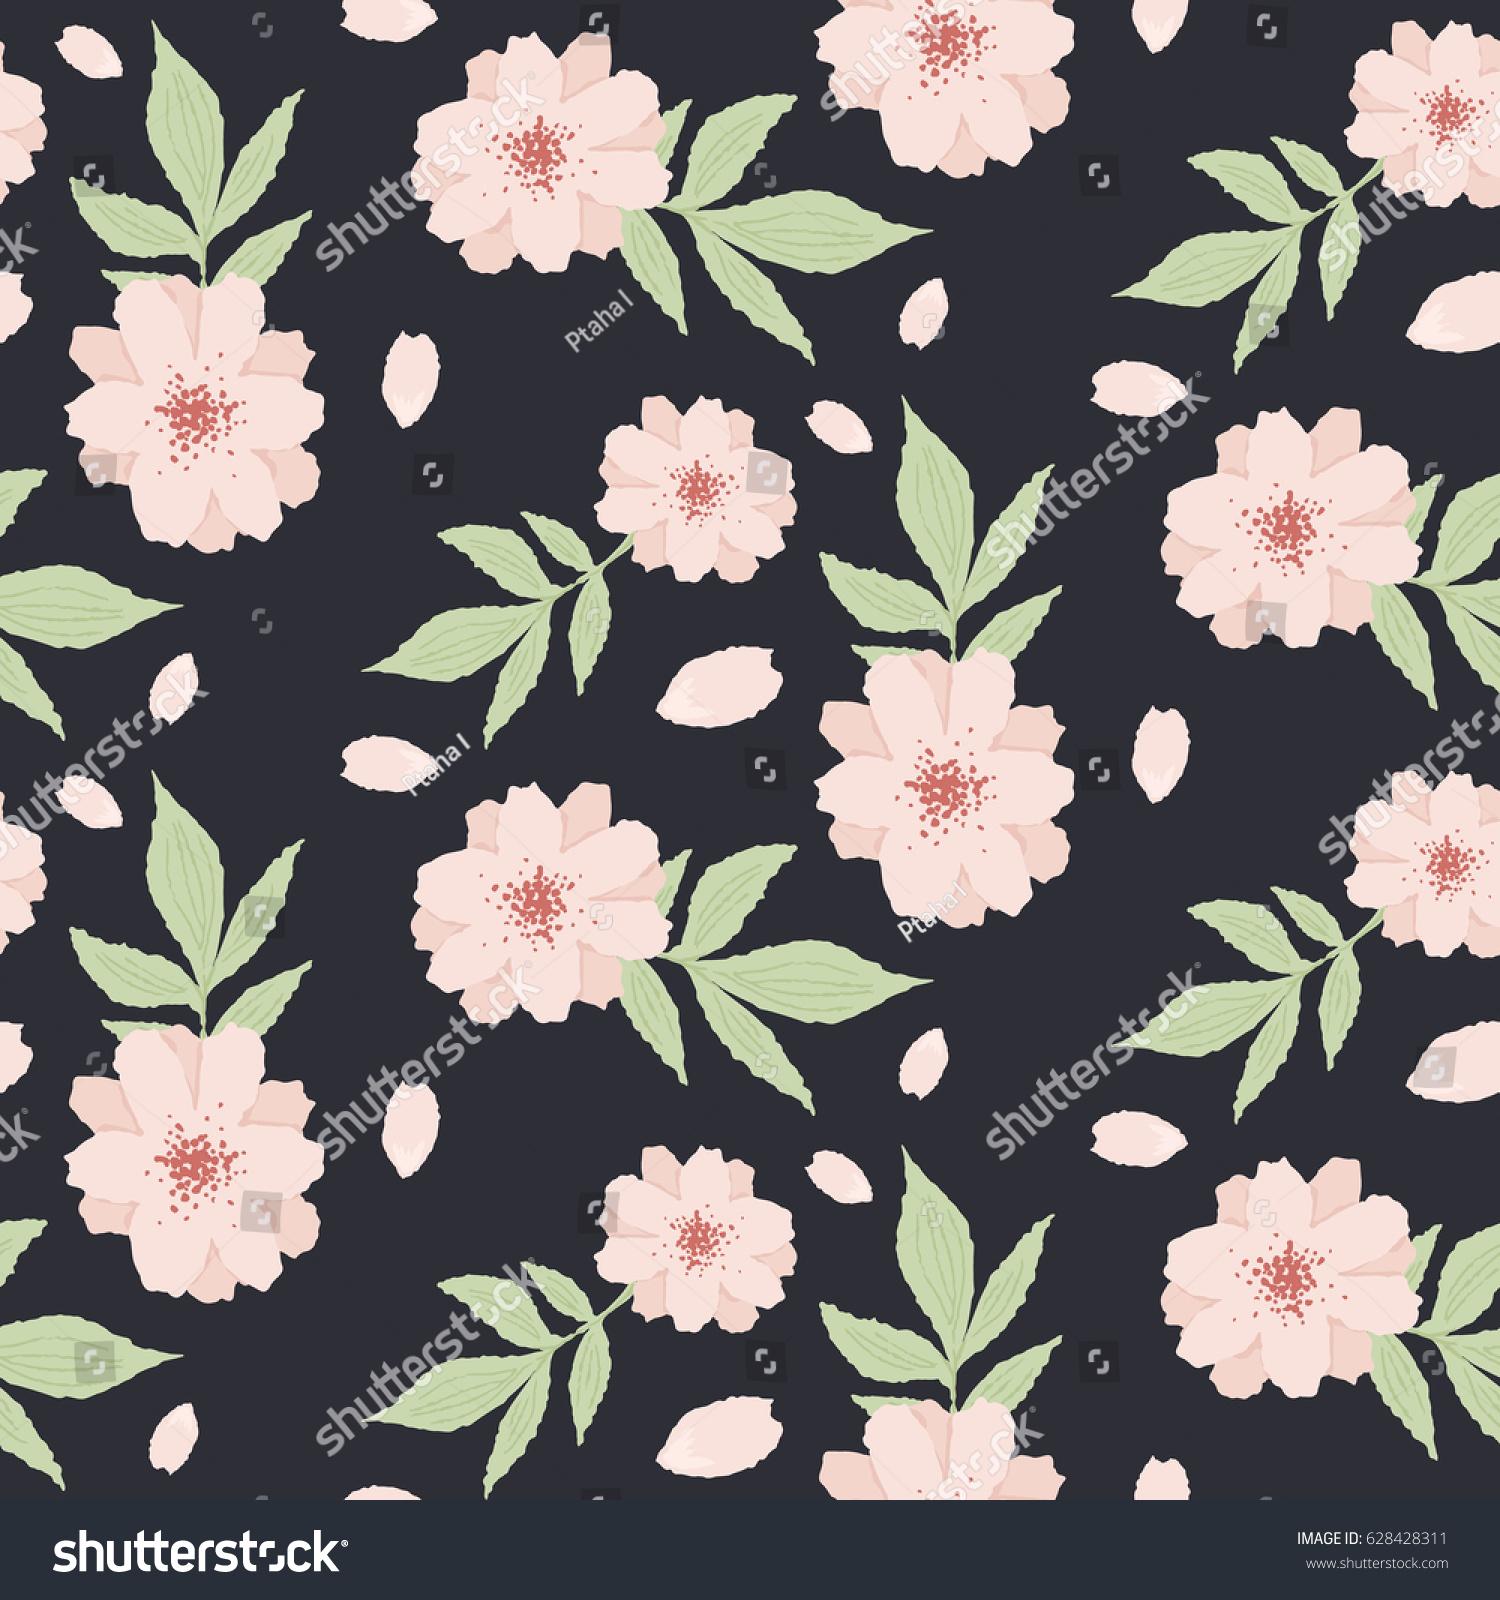 Delicate pink flowers wallpaper seamless pattern stock vector delicate pink flowers wallpaper seamless pattern on a black background mightylinksfo